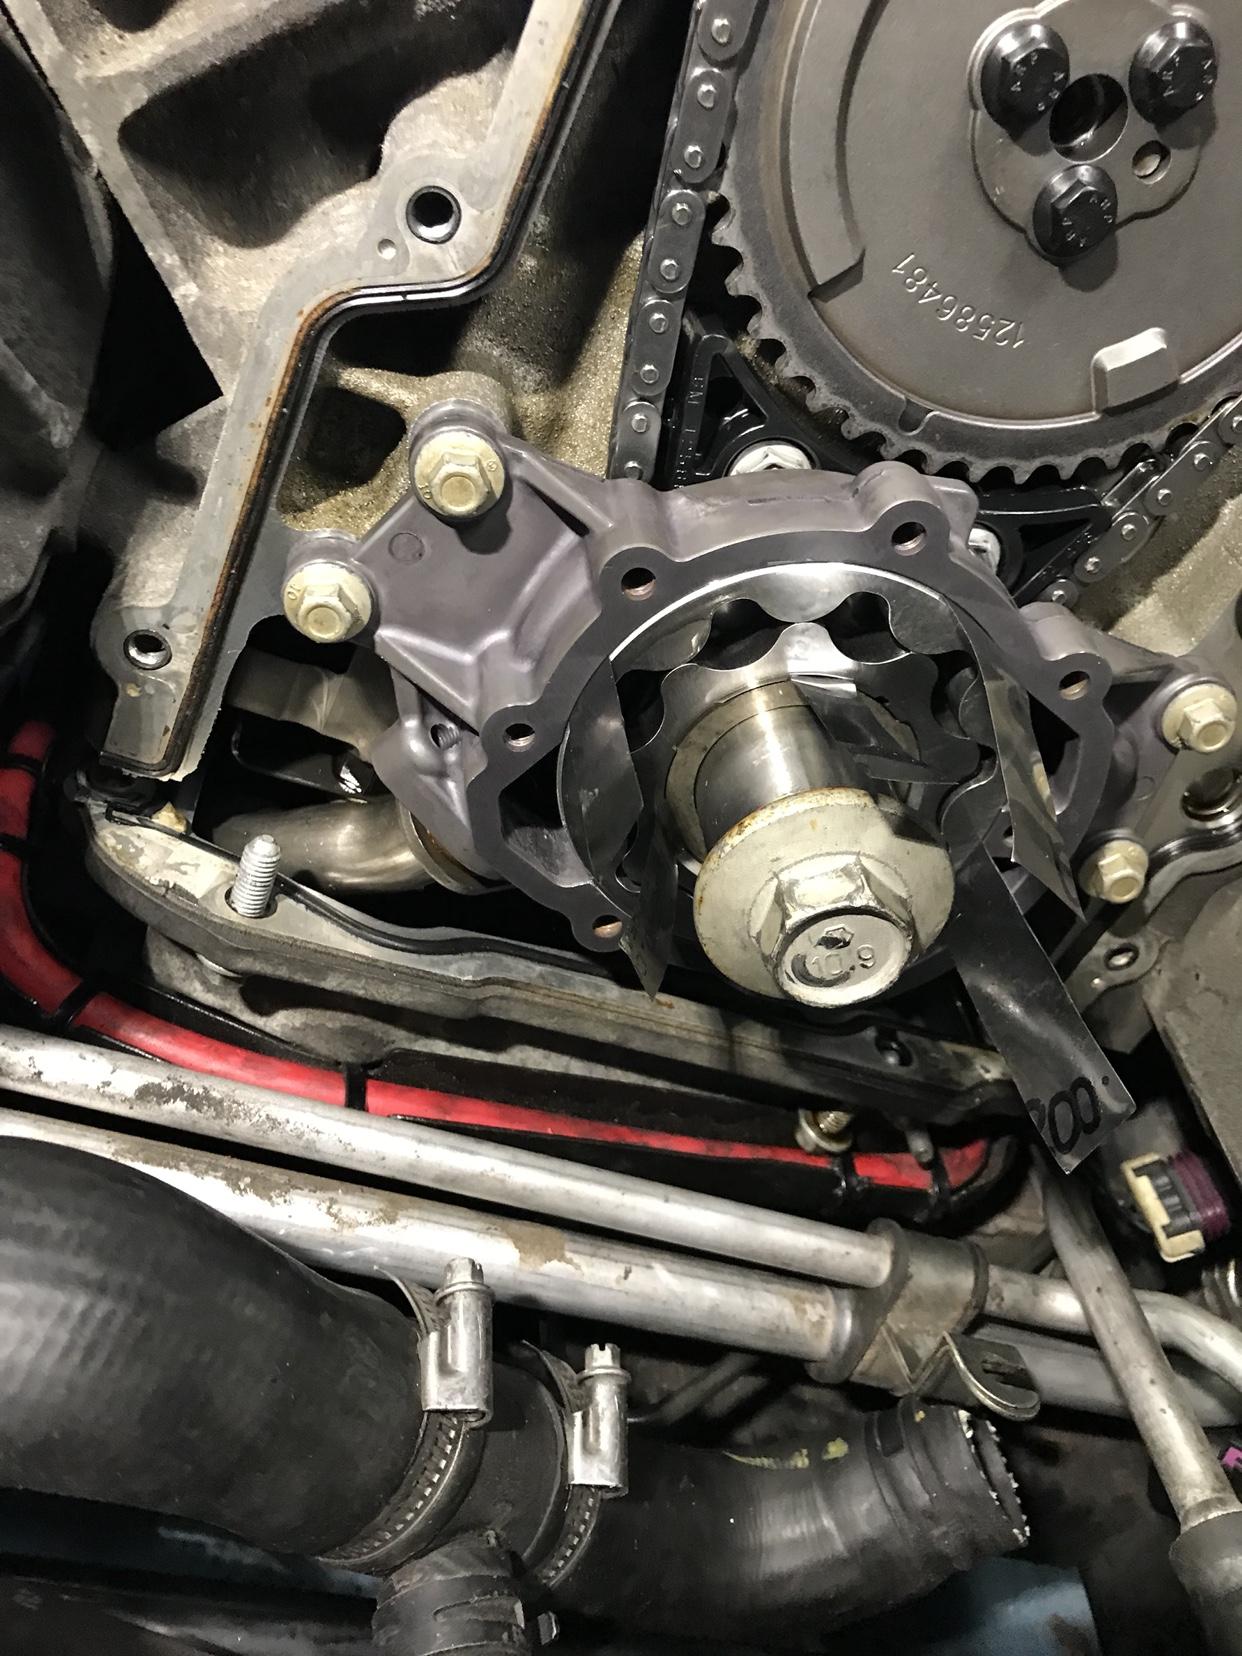 Melling oil pump install tips - Camaro5 Chevy Camaro Forum